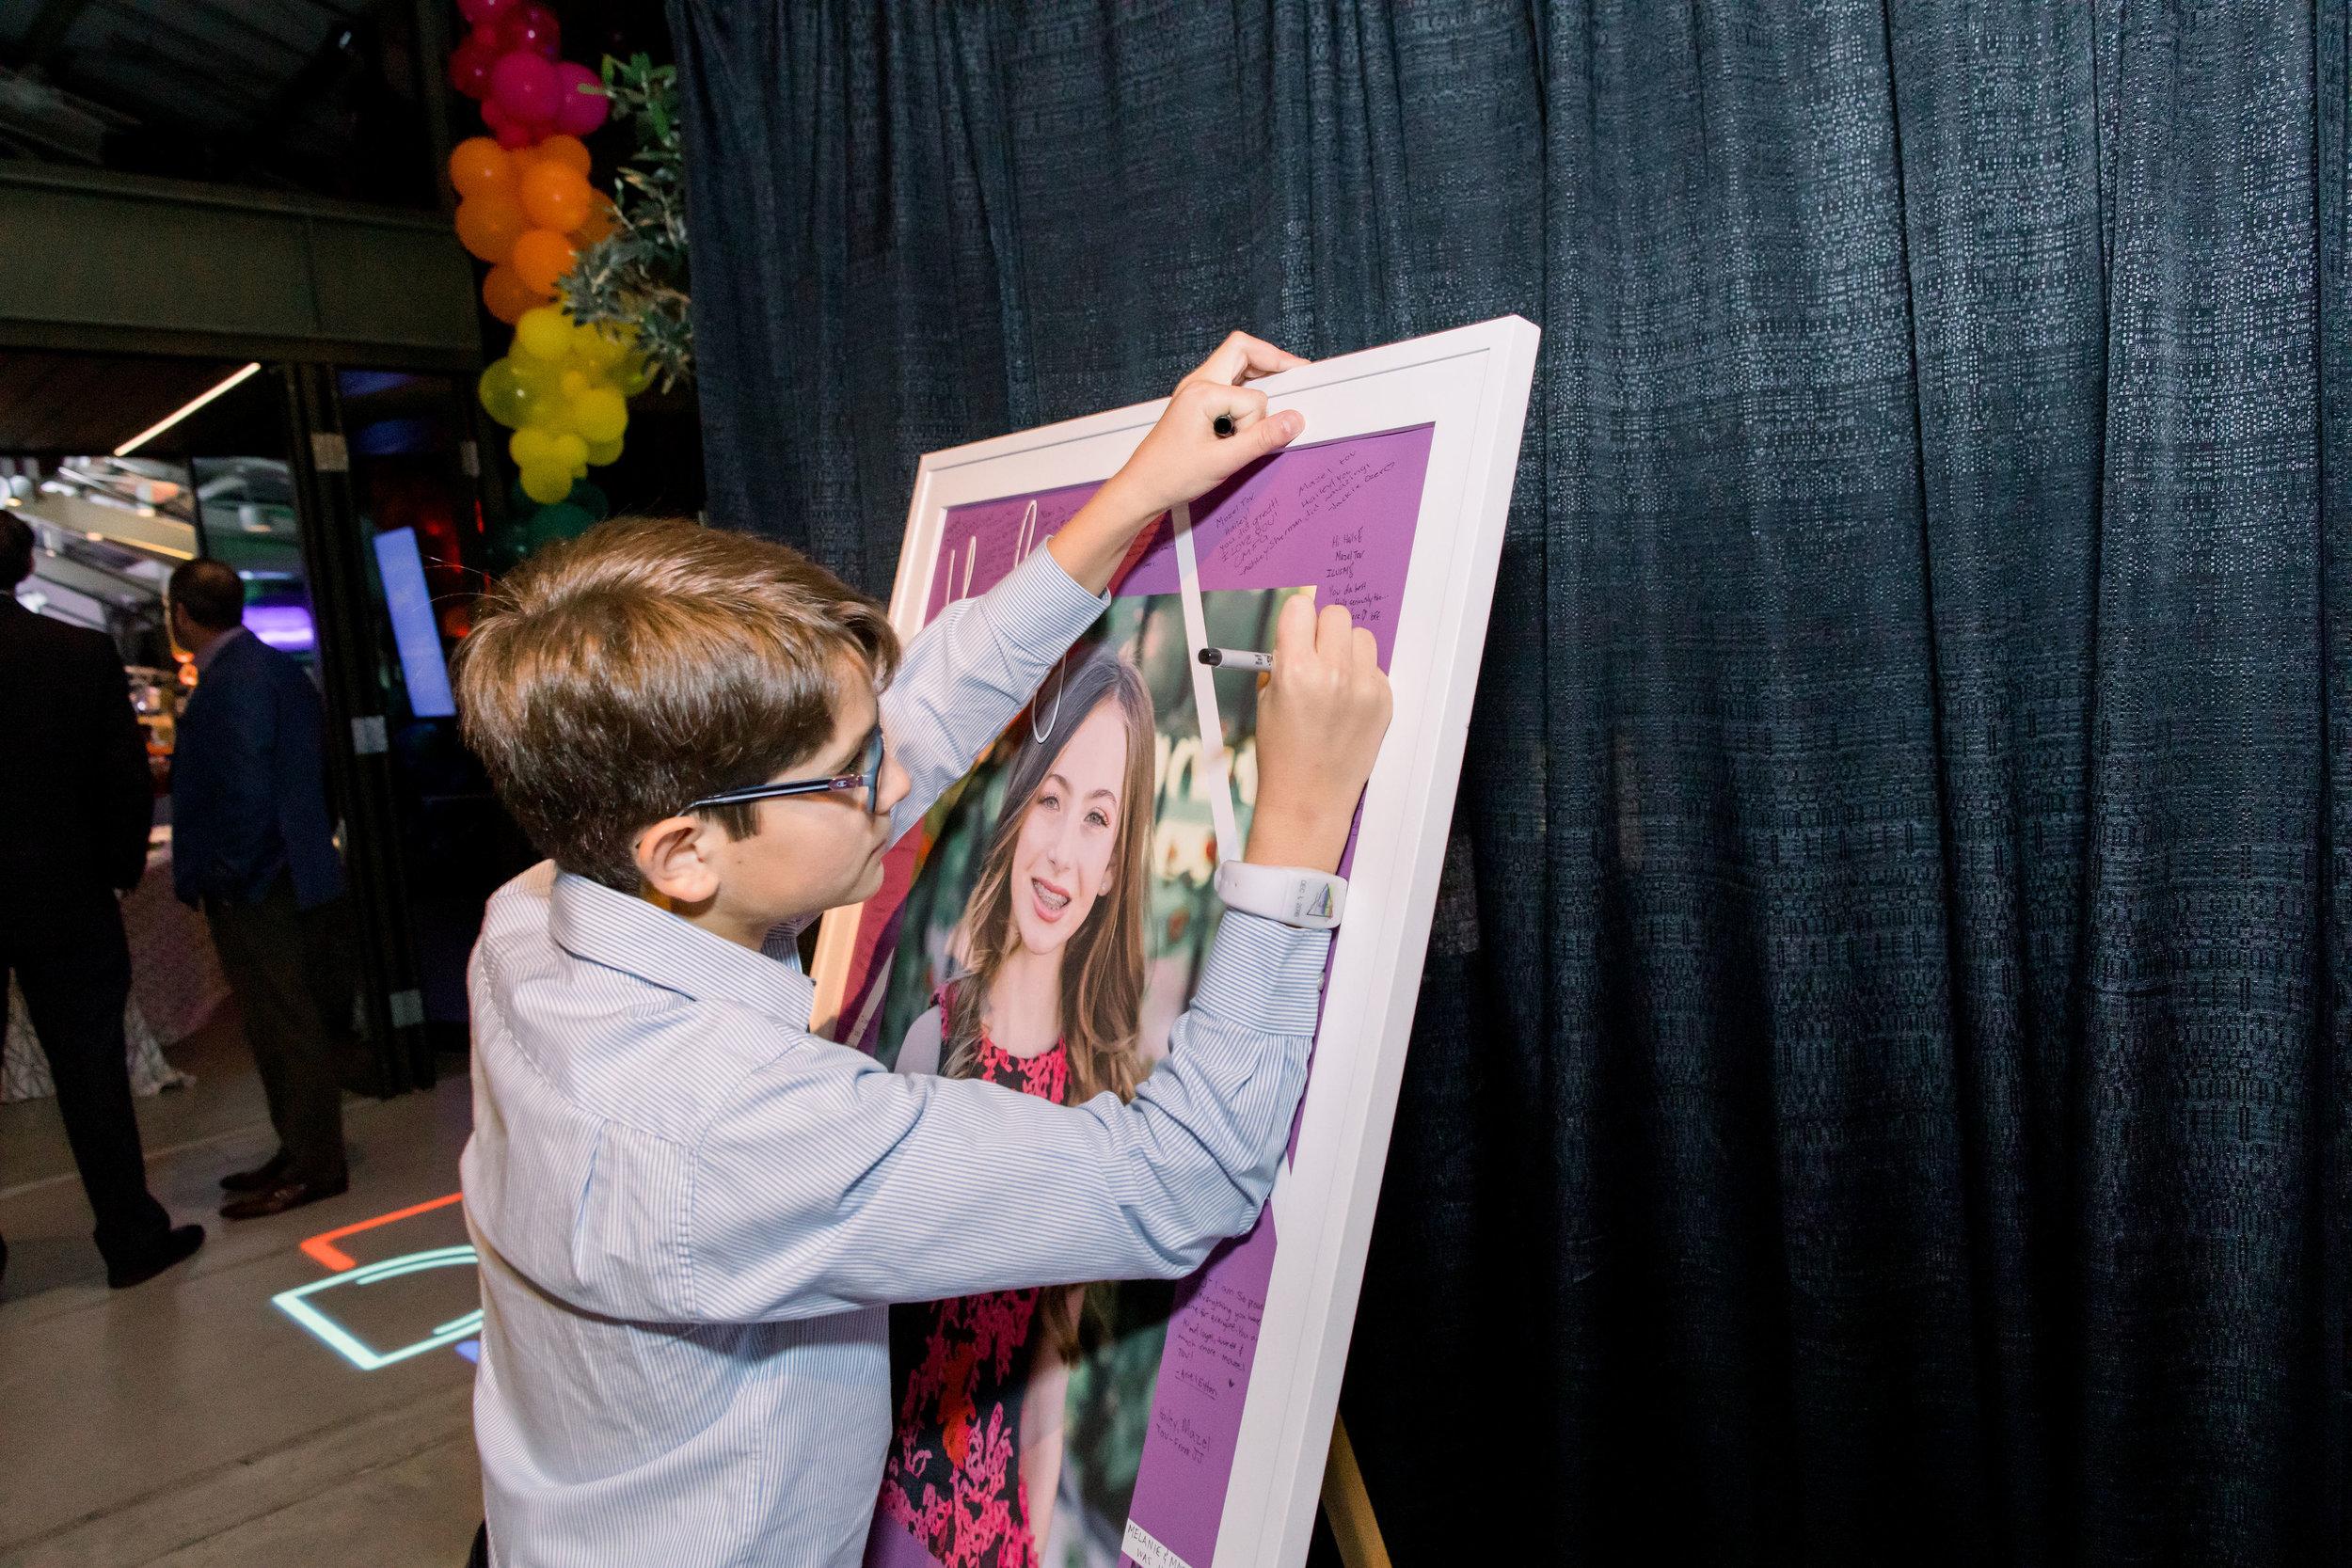 47 bat mitzvah guest book signed poster rainbow bat mitzvah party Life Design Events photos by Stephanie Heymann Photography.jpg